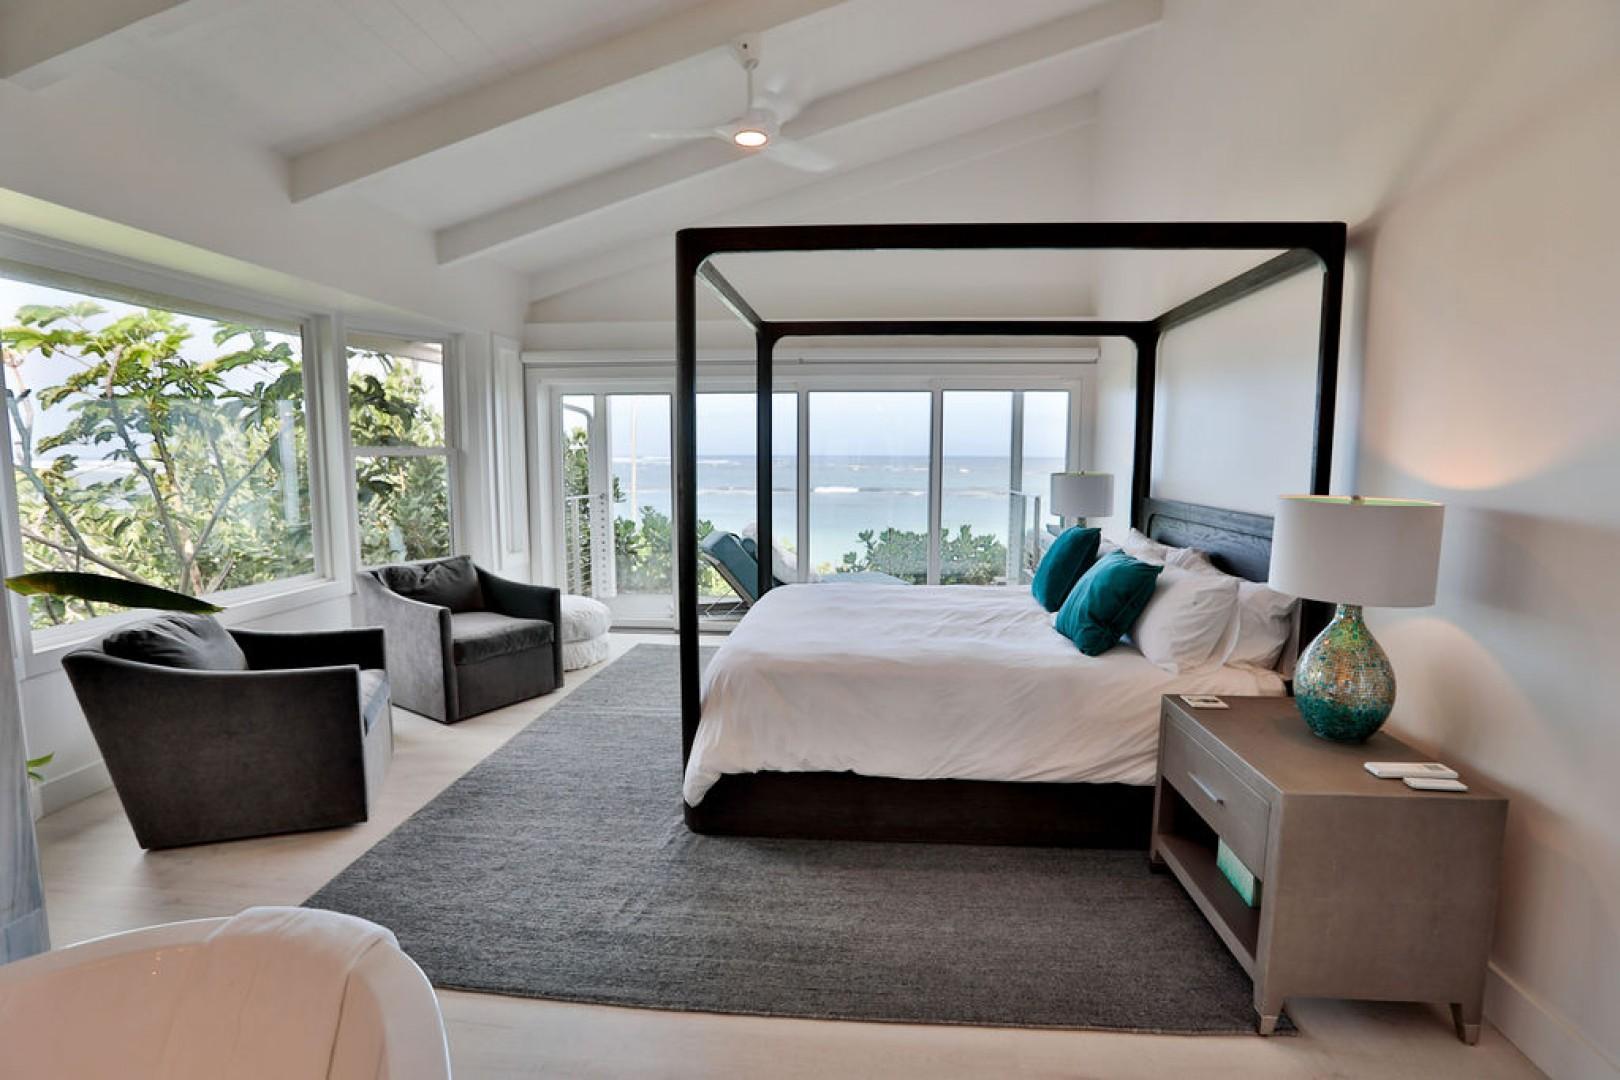 2nd Master Bedroom with beautiful ocean views